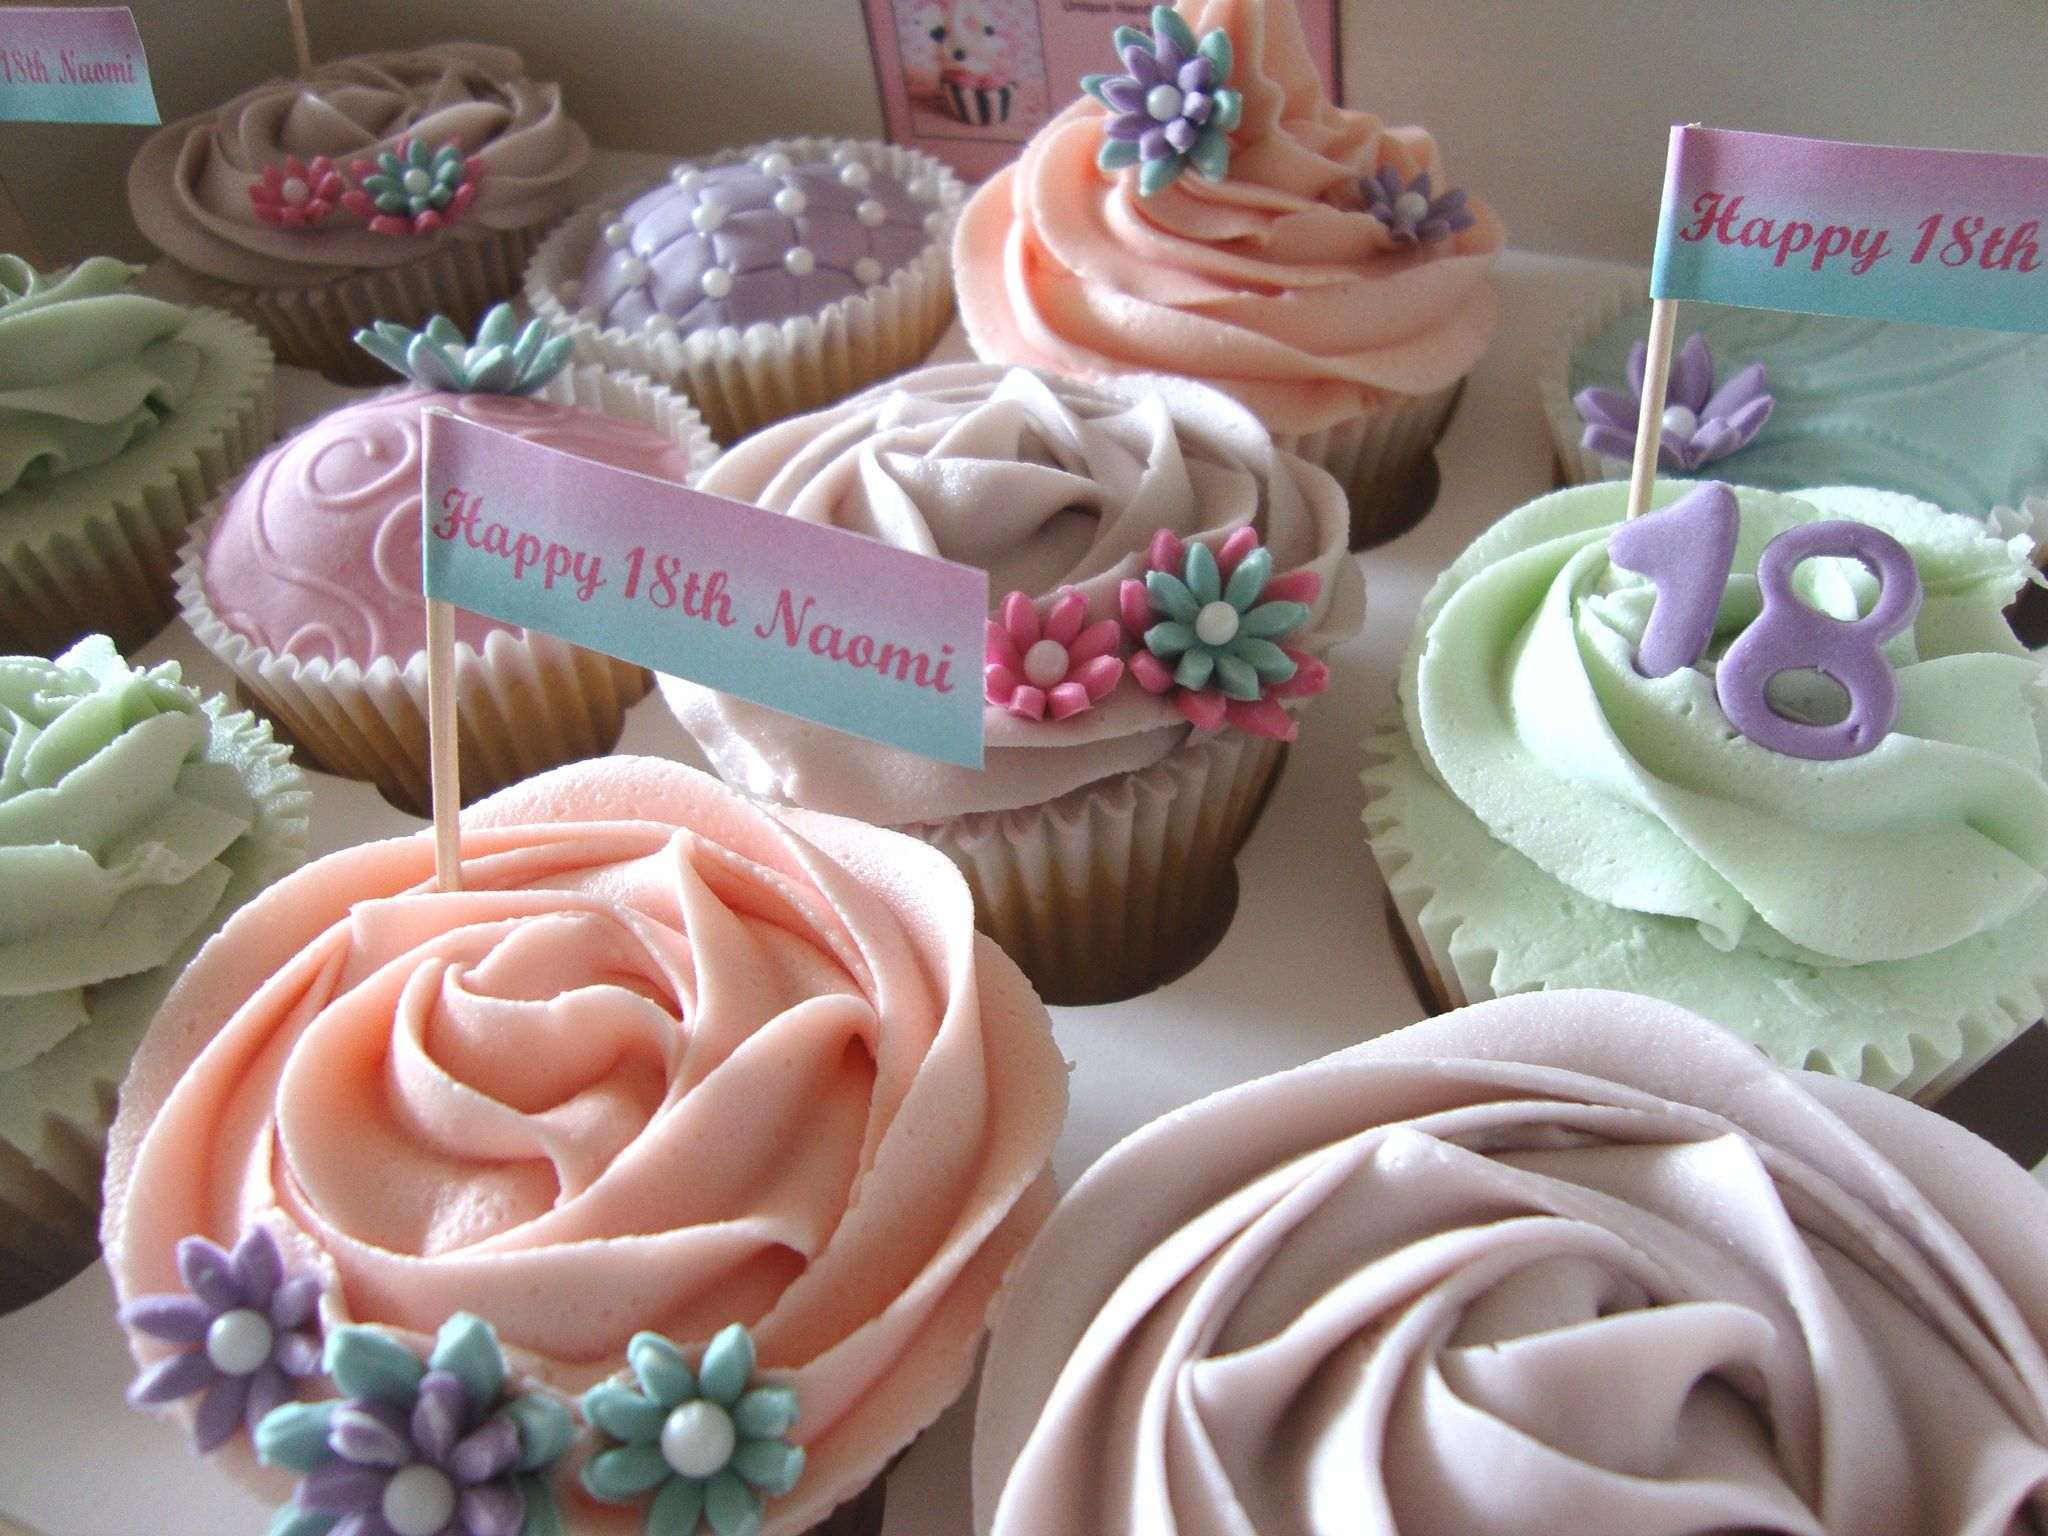 18th Birthday Cupcakes - www.aceofcupcakes.co.uk